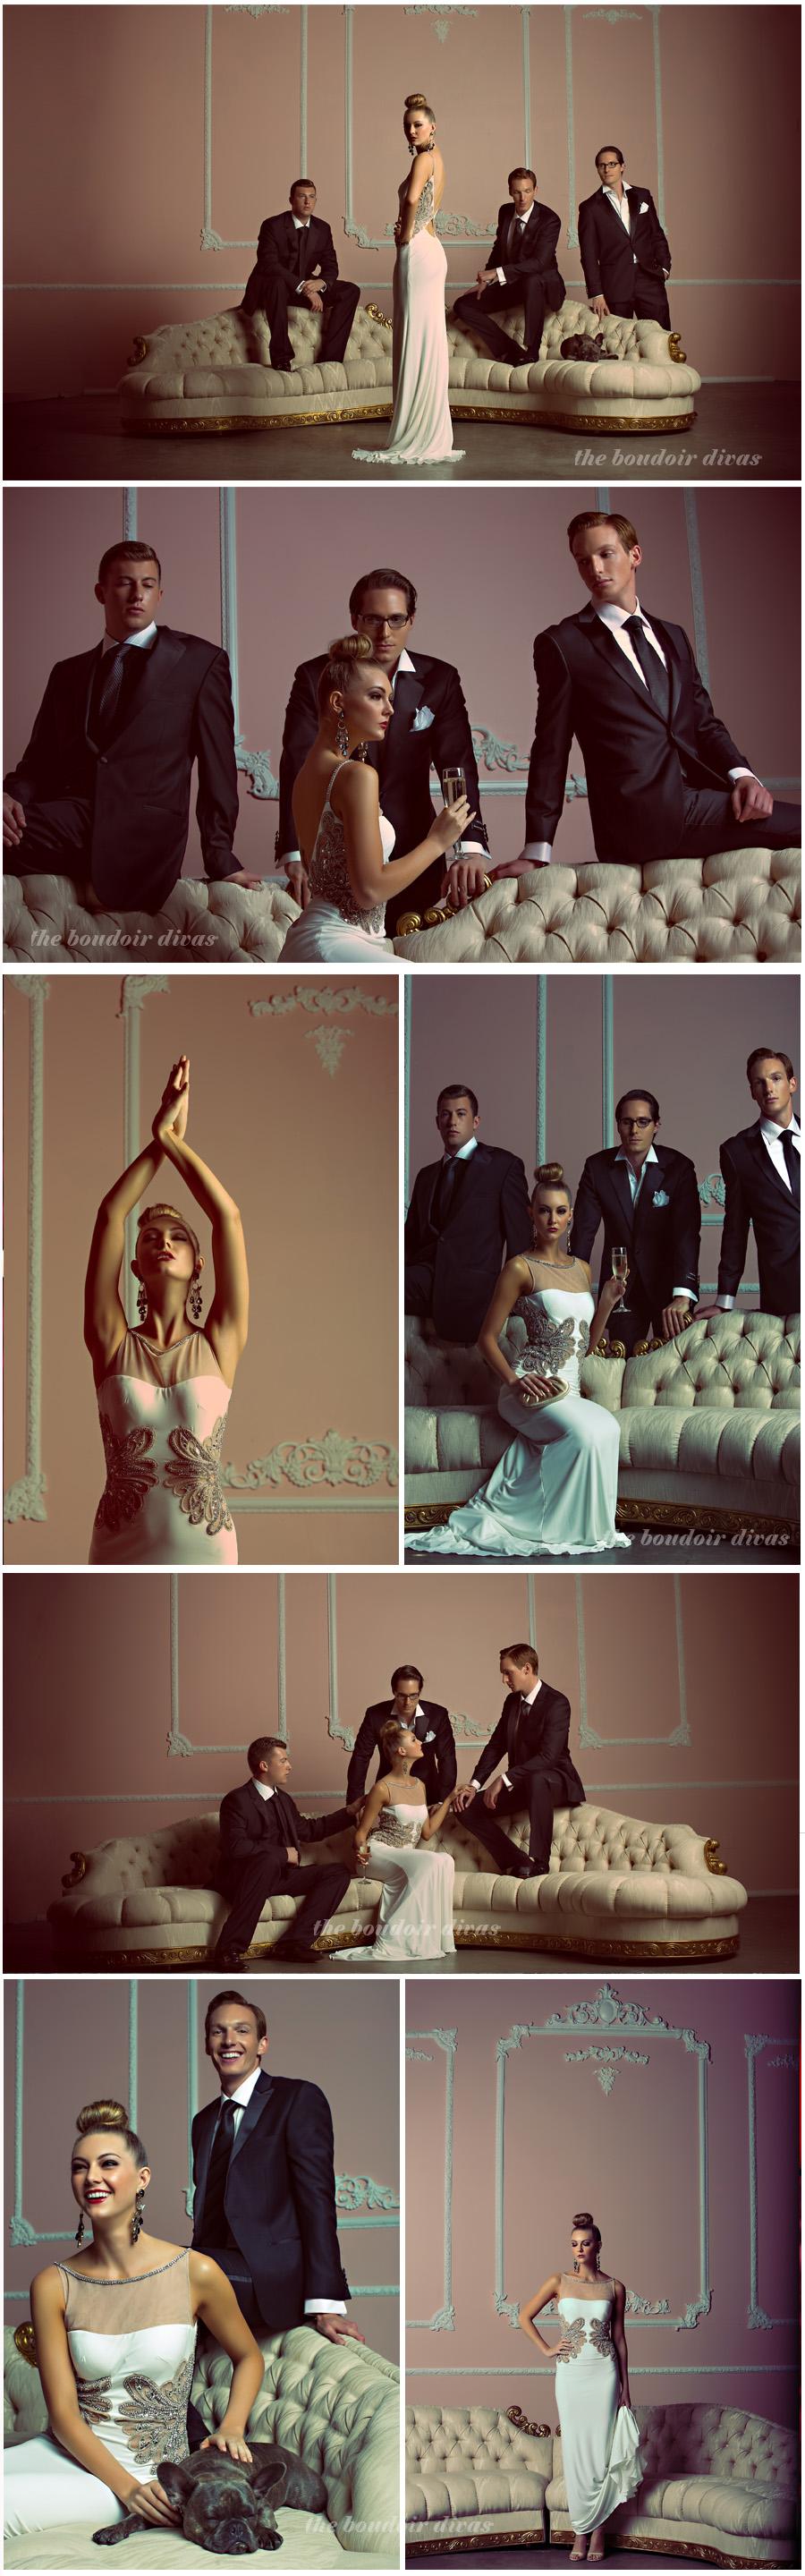 fine-magazine-boudoir-classic-photography